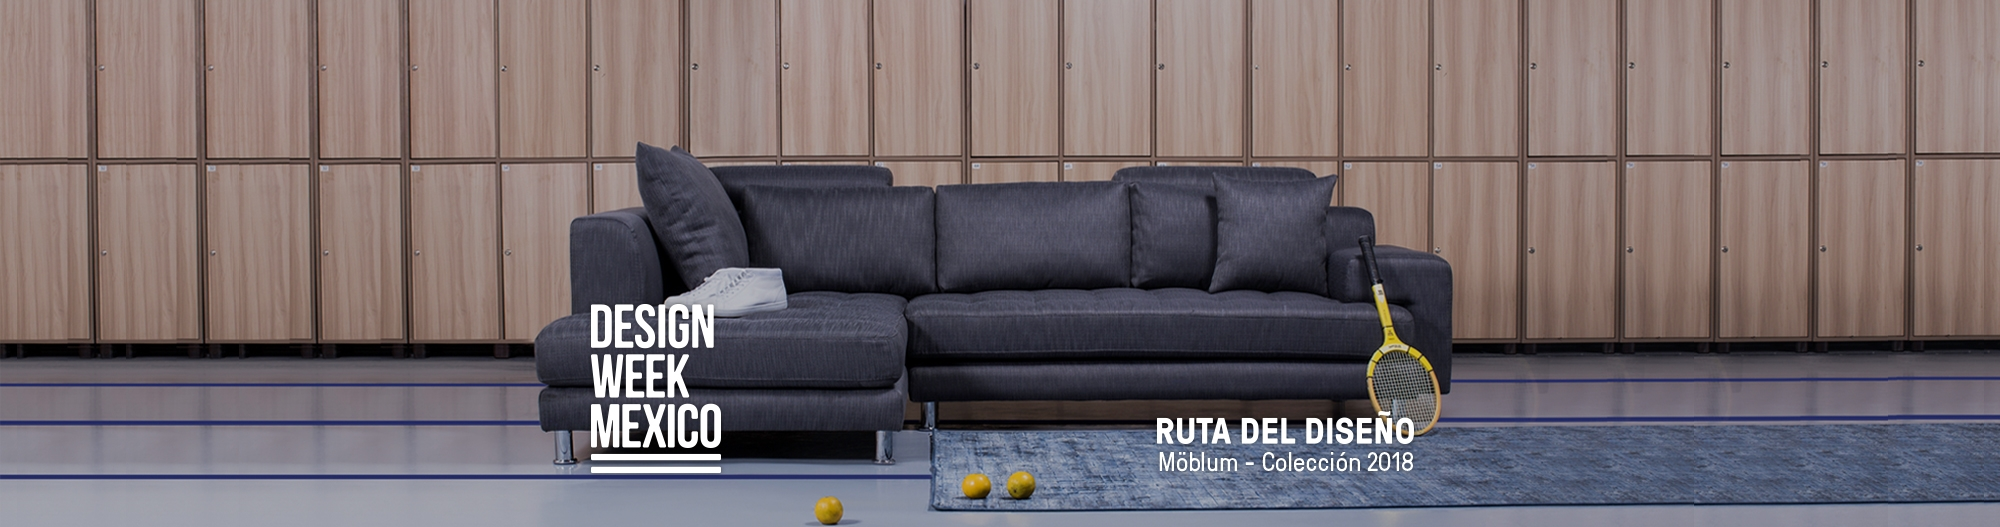 möblum-Design_Week_México_möblum-design_week_méxico-Ruta_del_Diseño